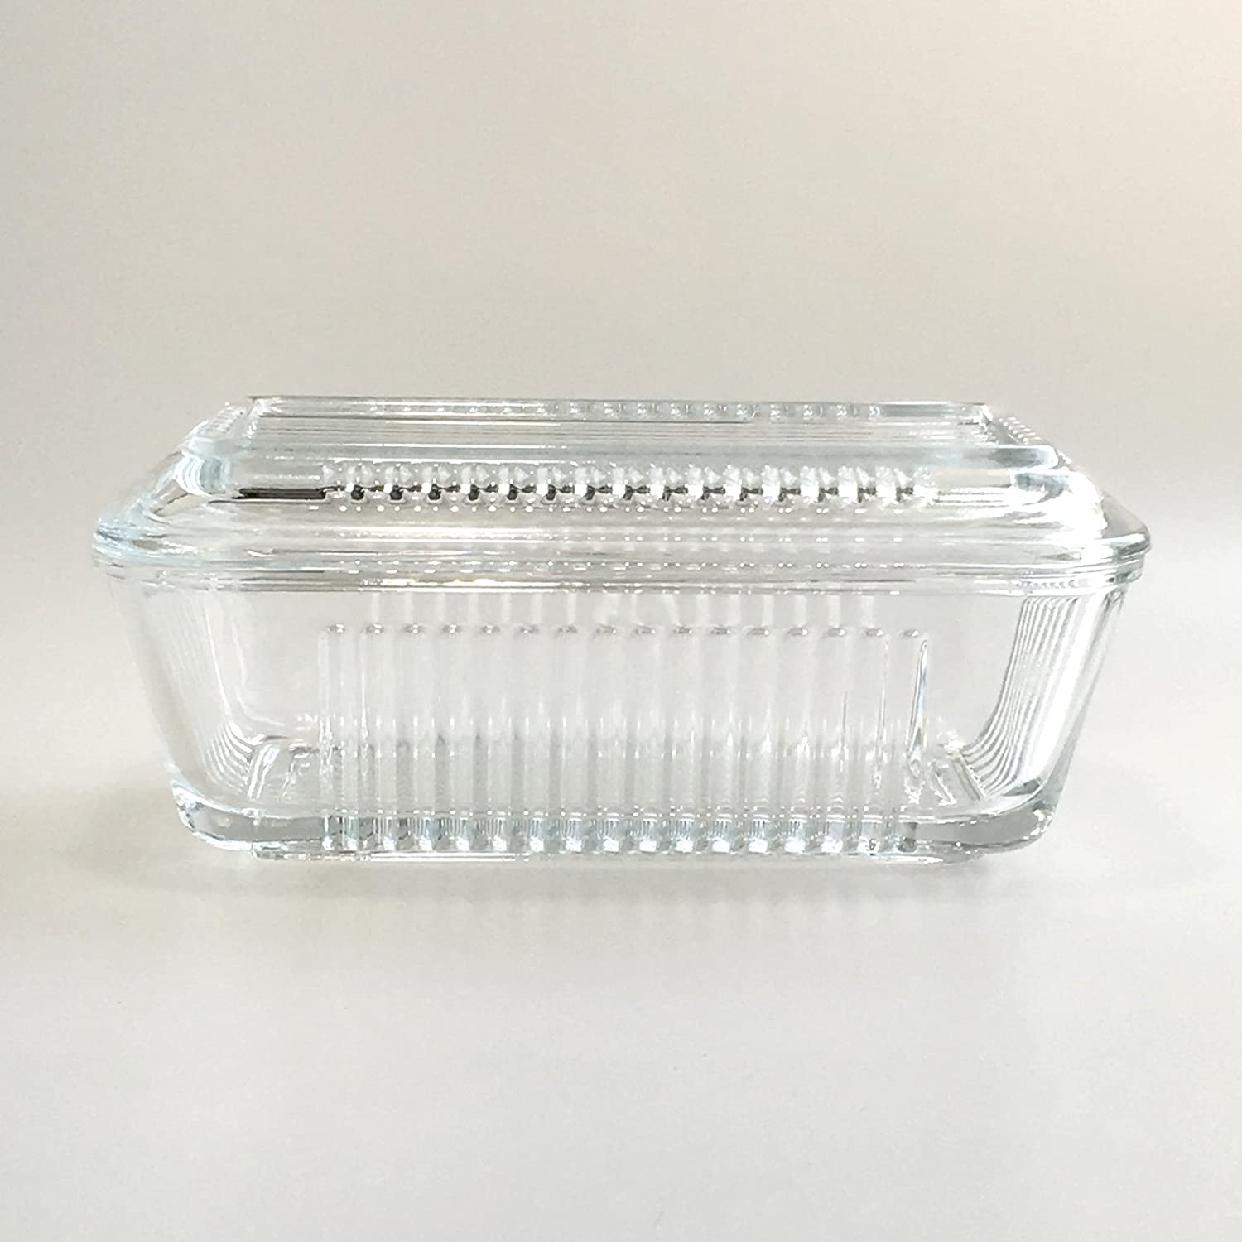 ADERIA(アデリア)バターケース H-3584の商品画像5